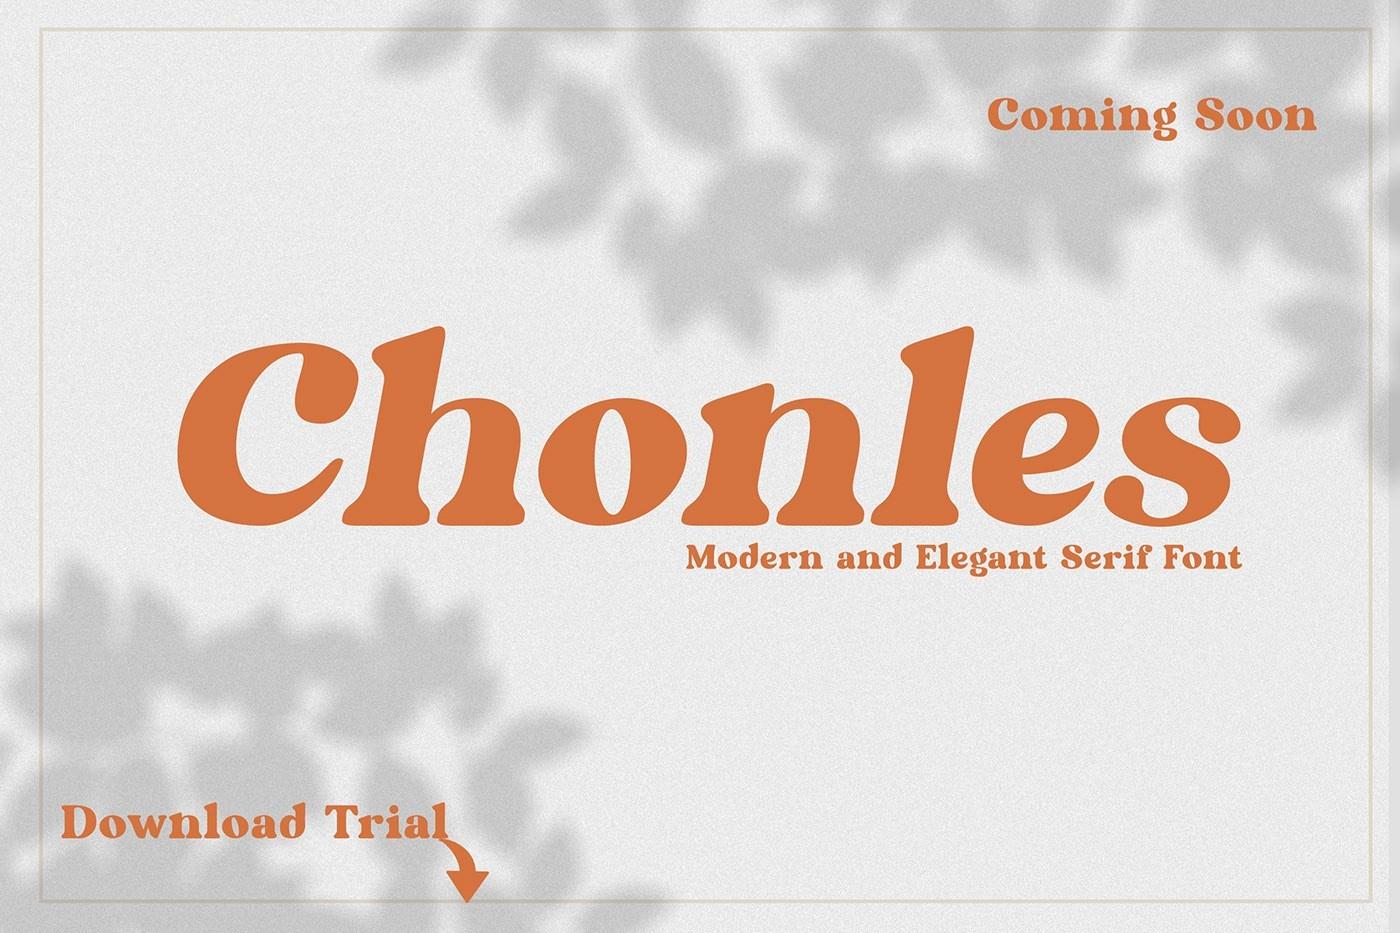 Chonles-Serif-Font